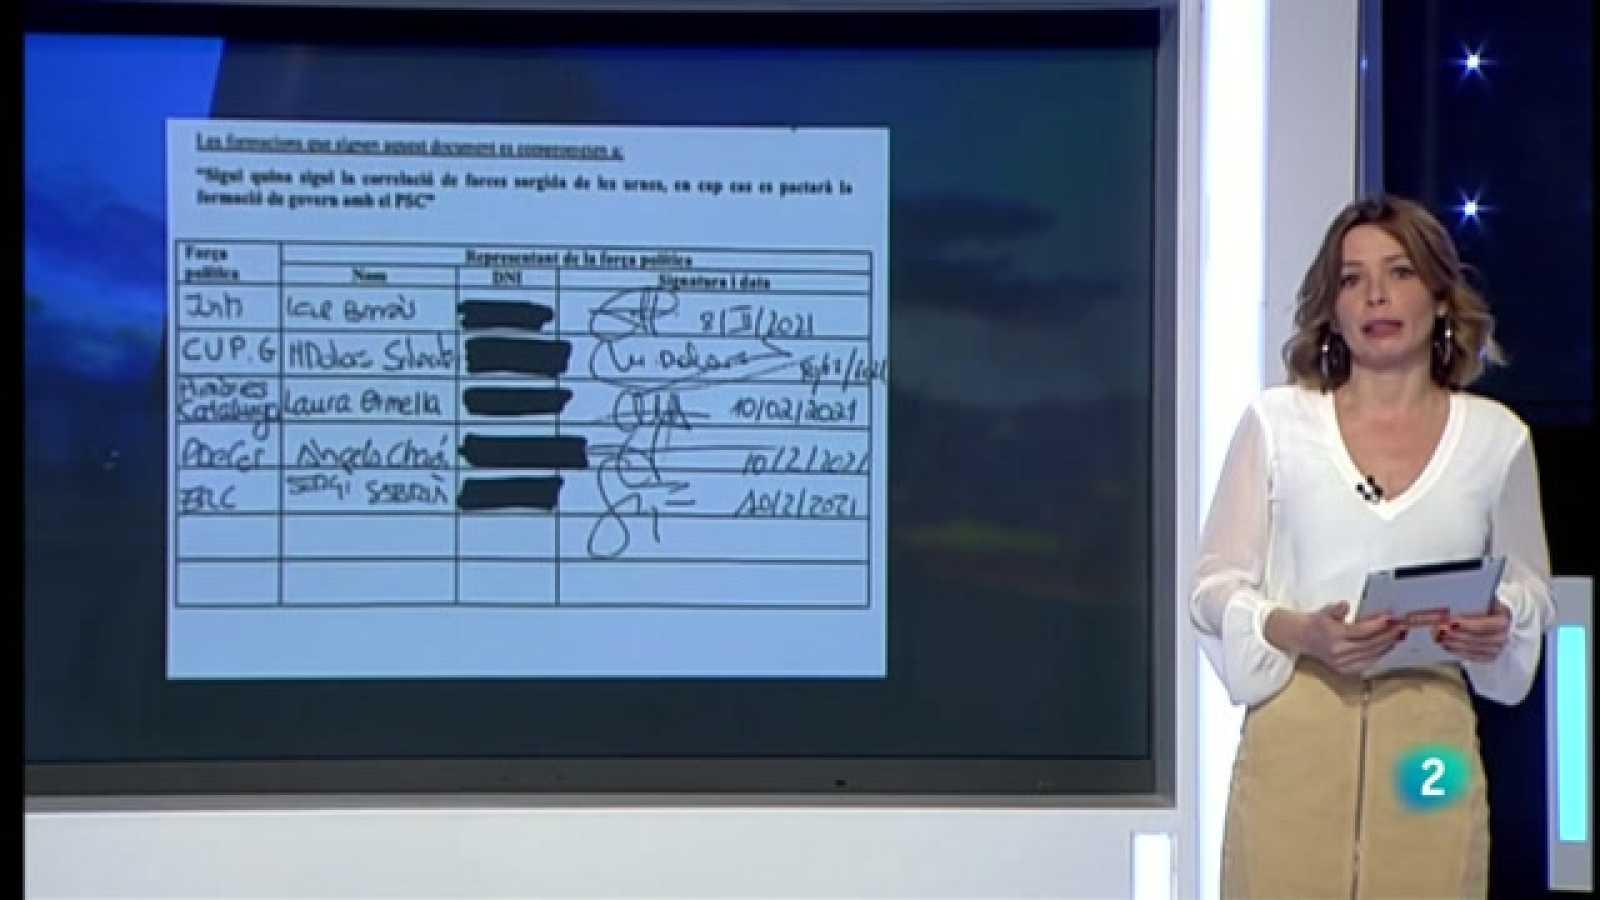 El pacte independentista contra el PSC tensiona la cursa electoral